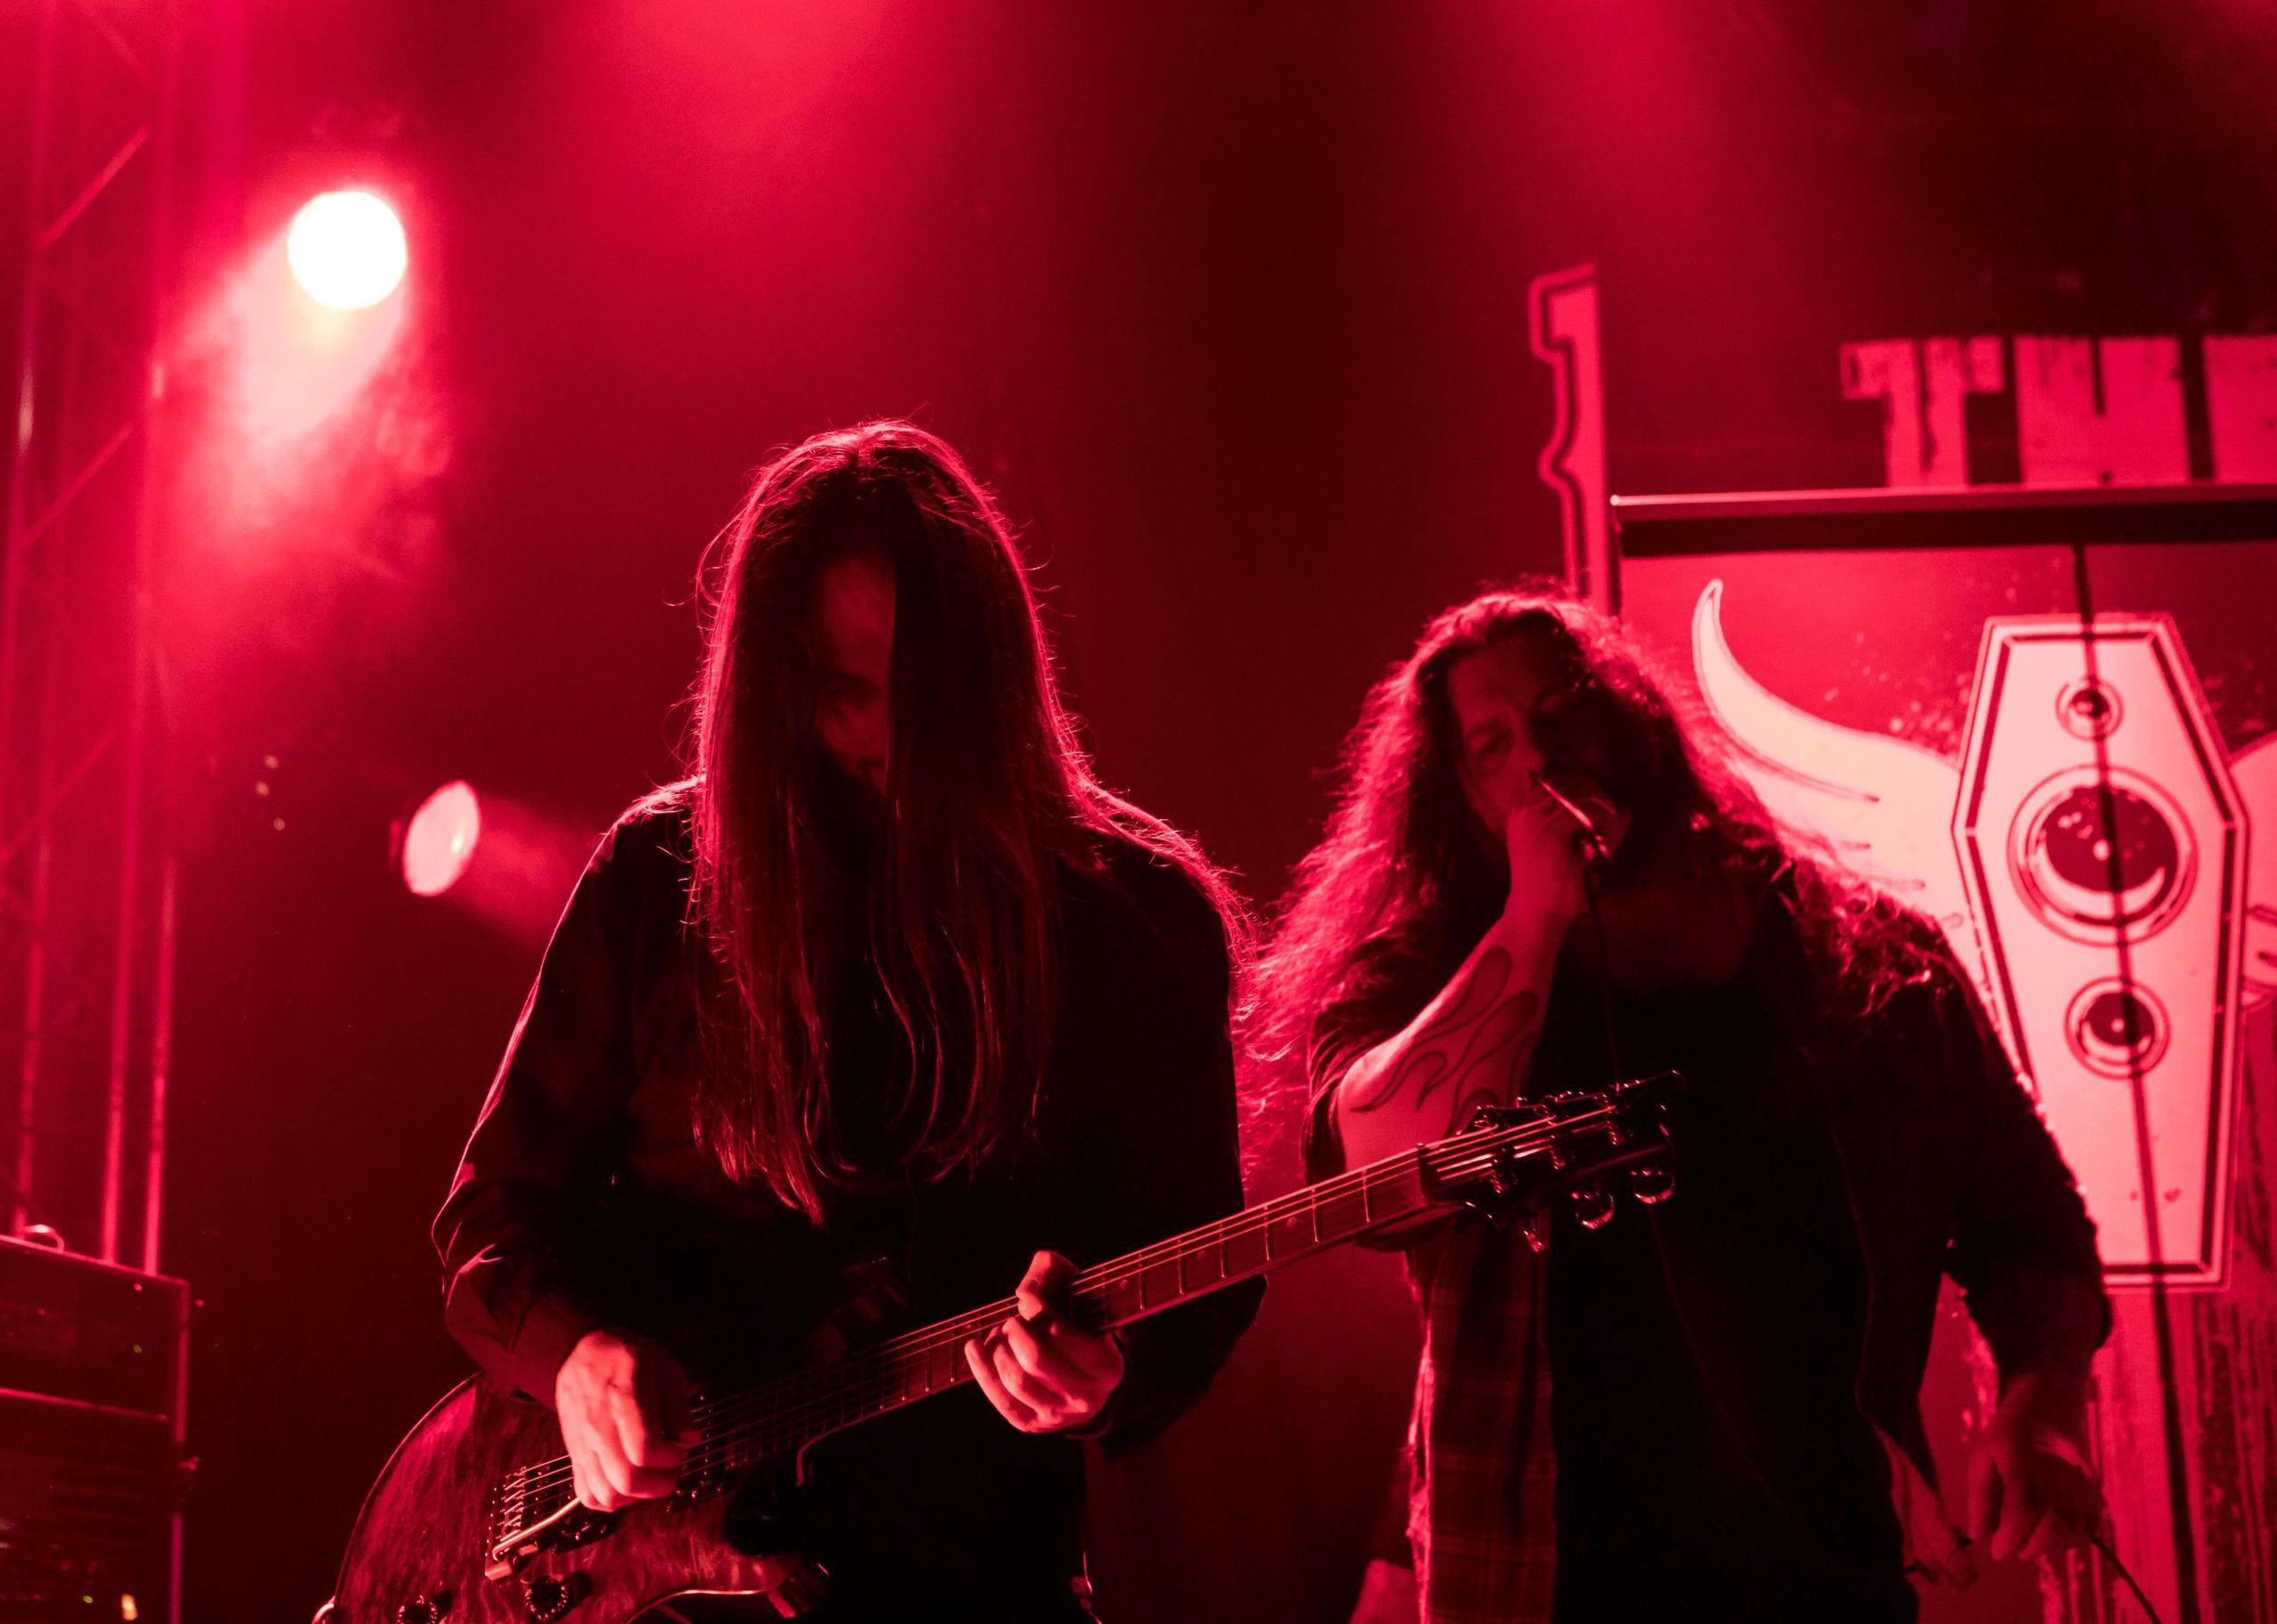 the-very-end-live-zeche-carl-essen-germany-thrash-metal_8